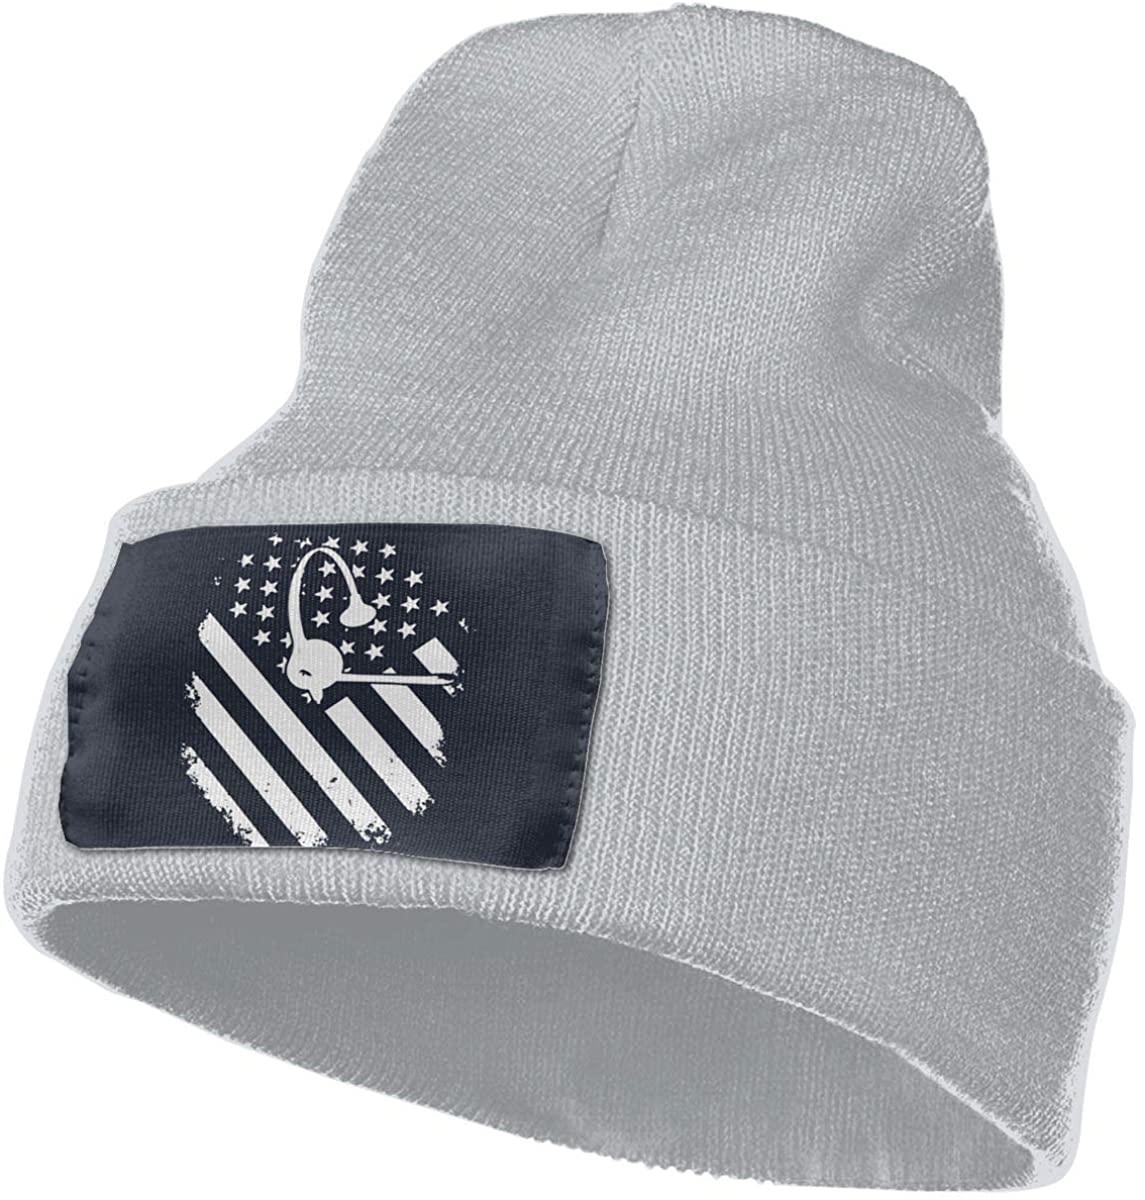 SOURCE POINT Unisex Beanie Hat Dispatcher Flag 911 Knit Hat Cap Skull Cap